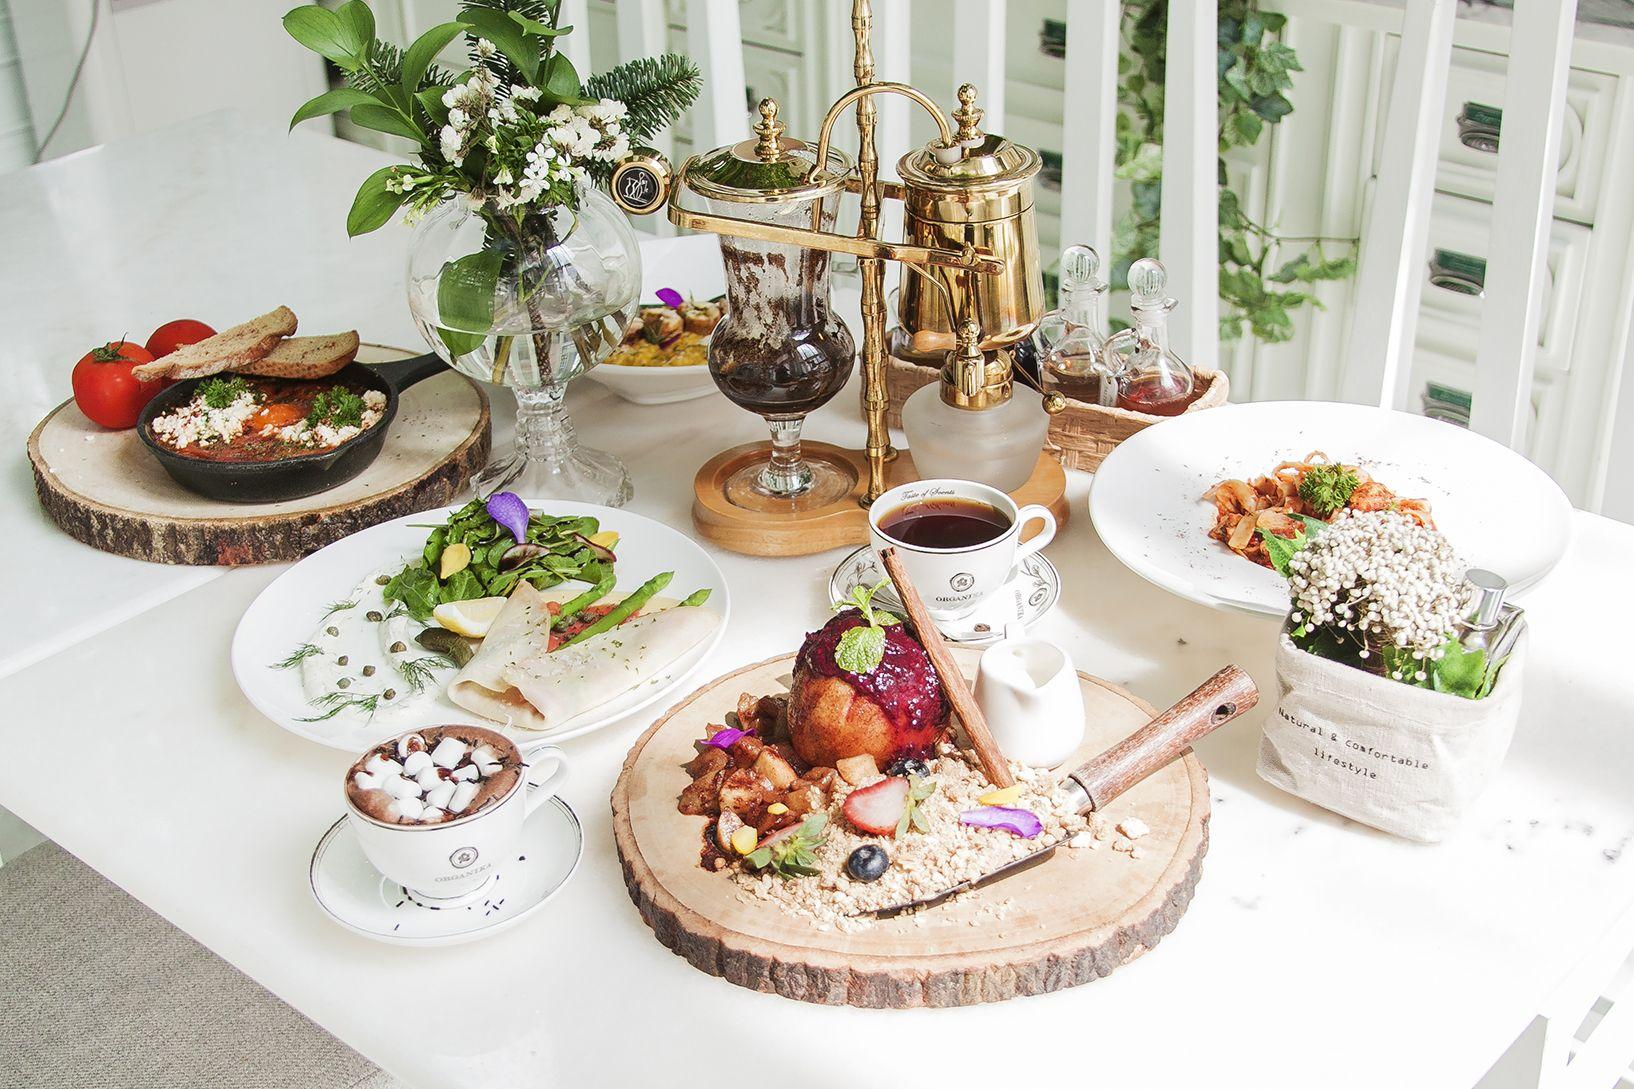 Big meal for all   #ORGANIKAHOUSE #Organika #House # ...